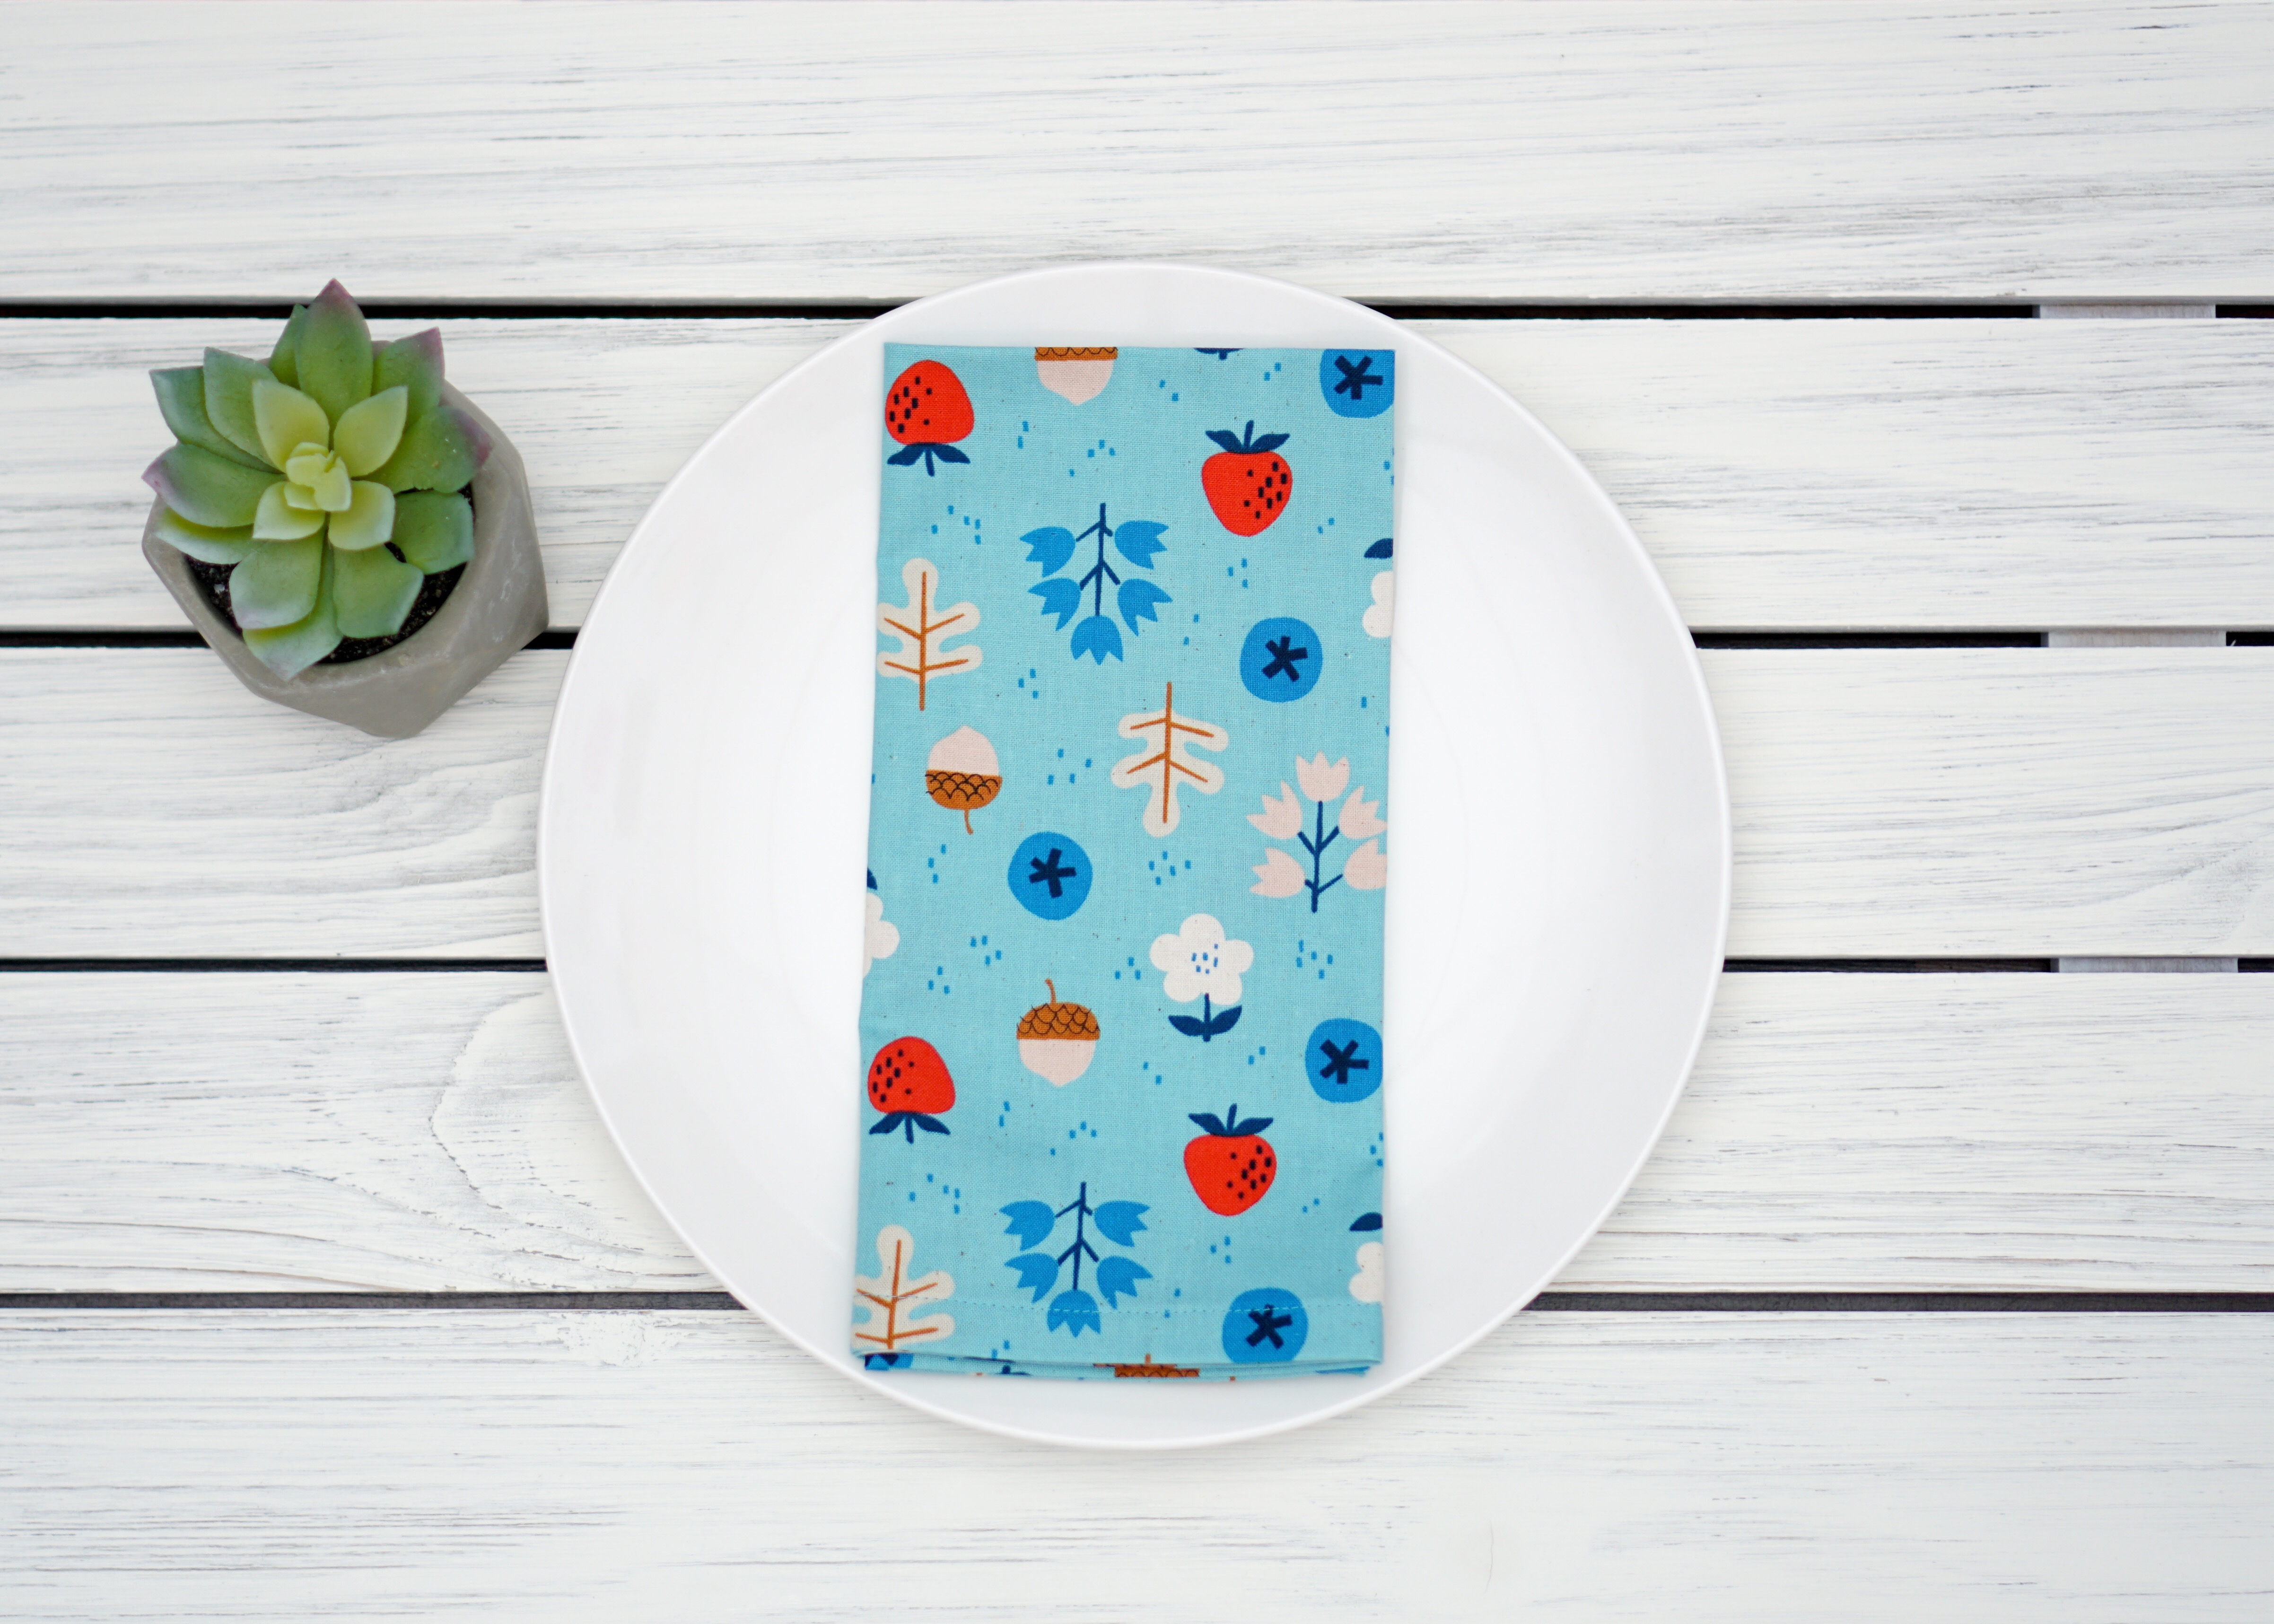 Cloth Napkins - Acorns and Strawberries